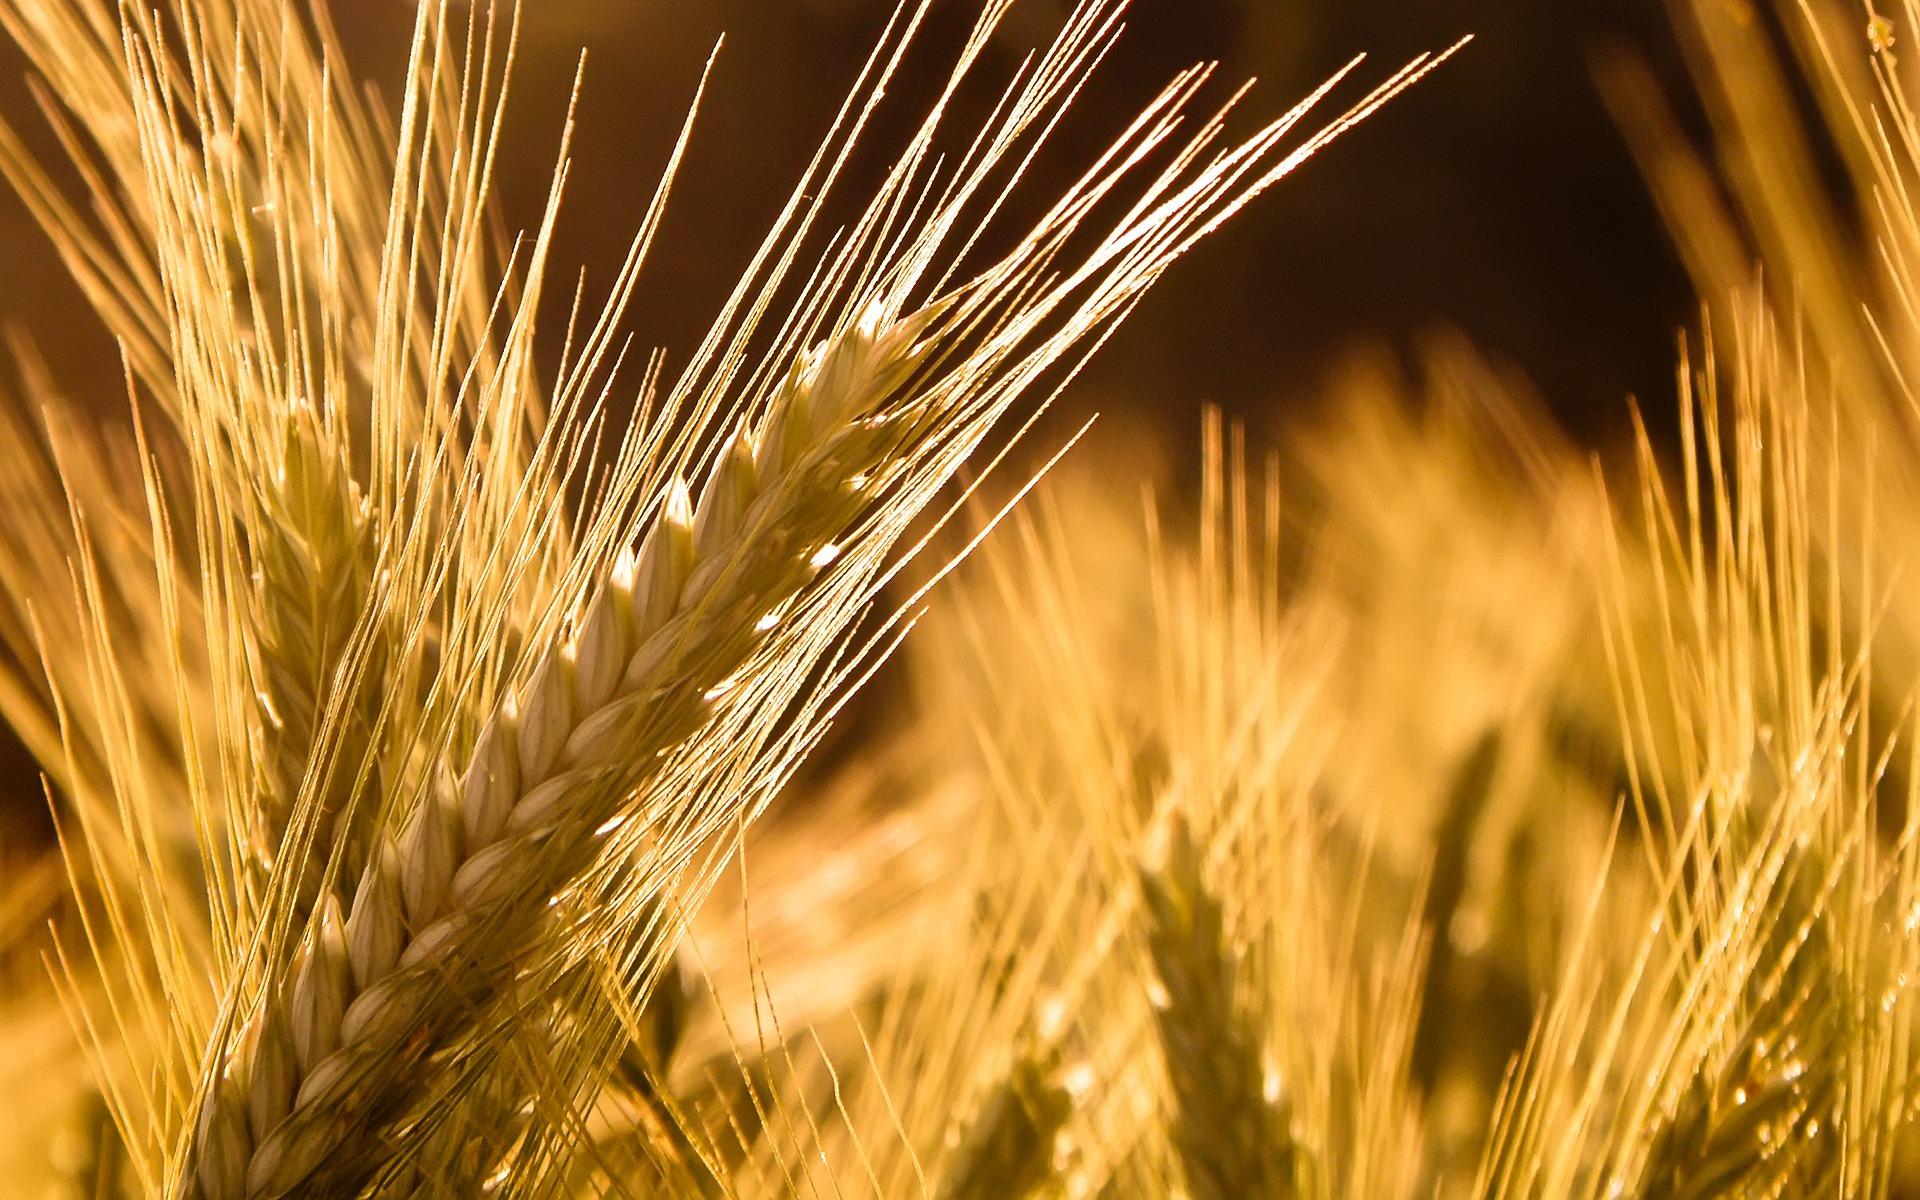 Barley Wallpaper Plants Nature 00431355